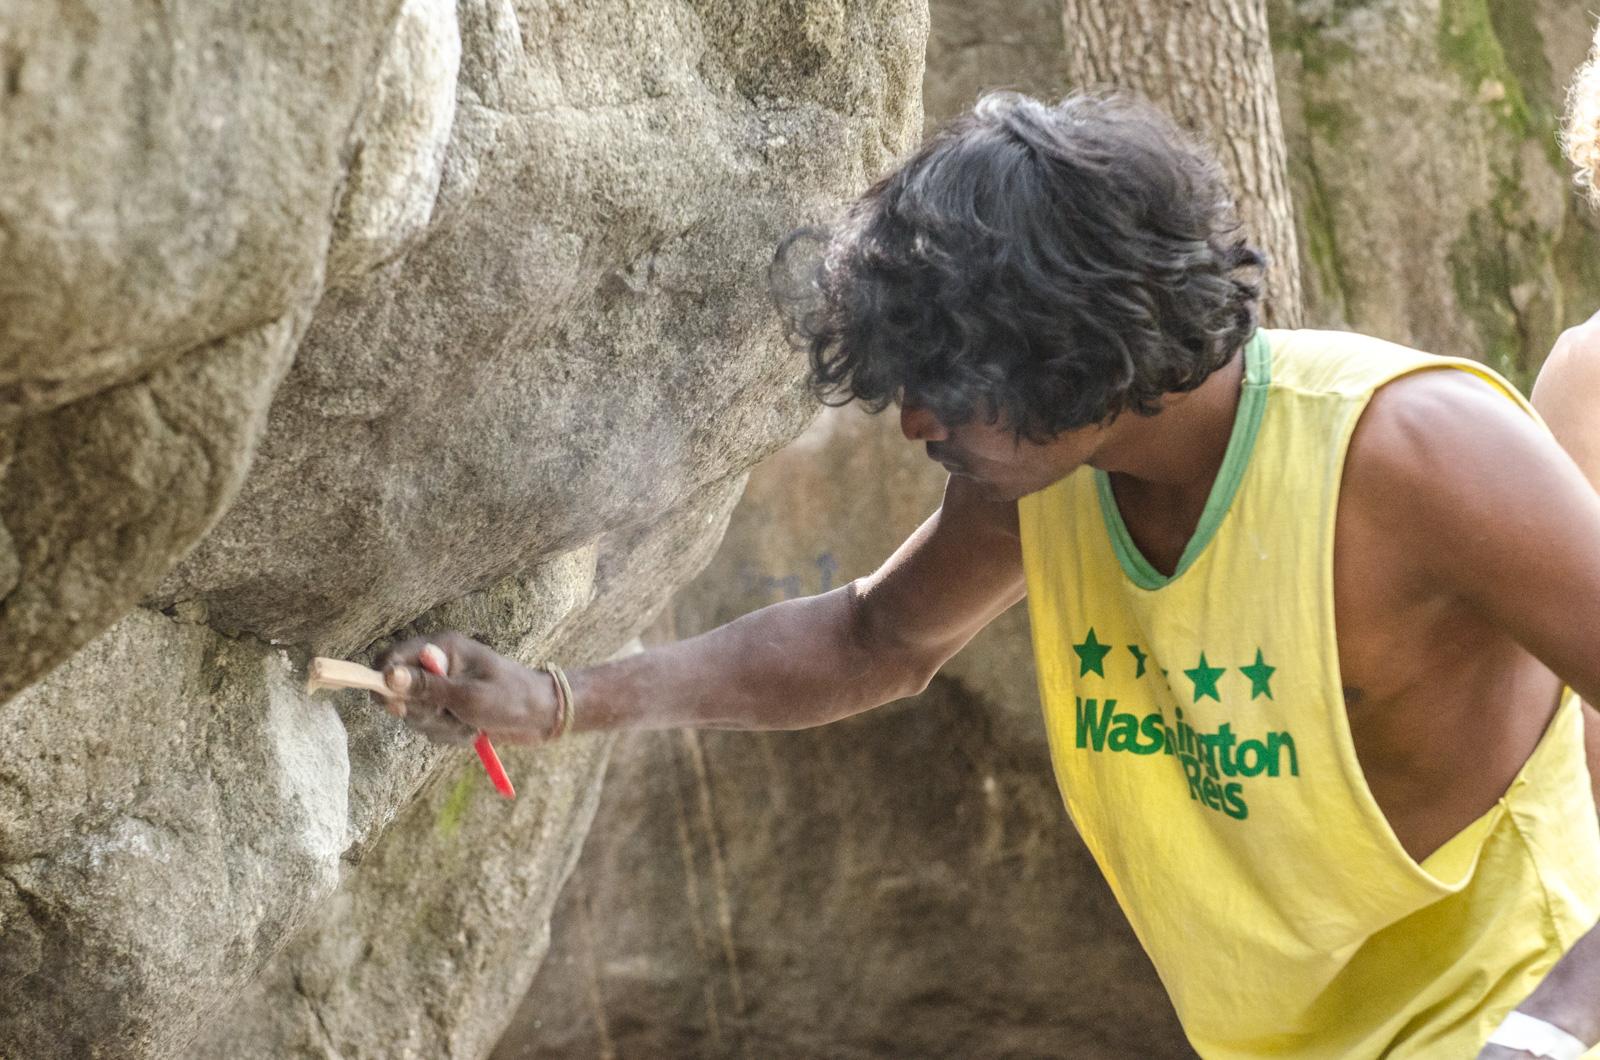 Manali-HimachalPradesh-Bouldering-RockClimbing-AmyRolloPhoto-2870.jpg